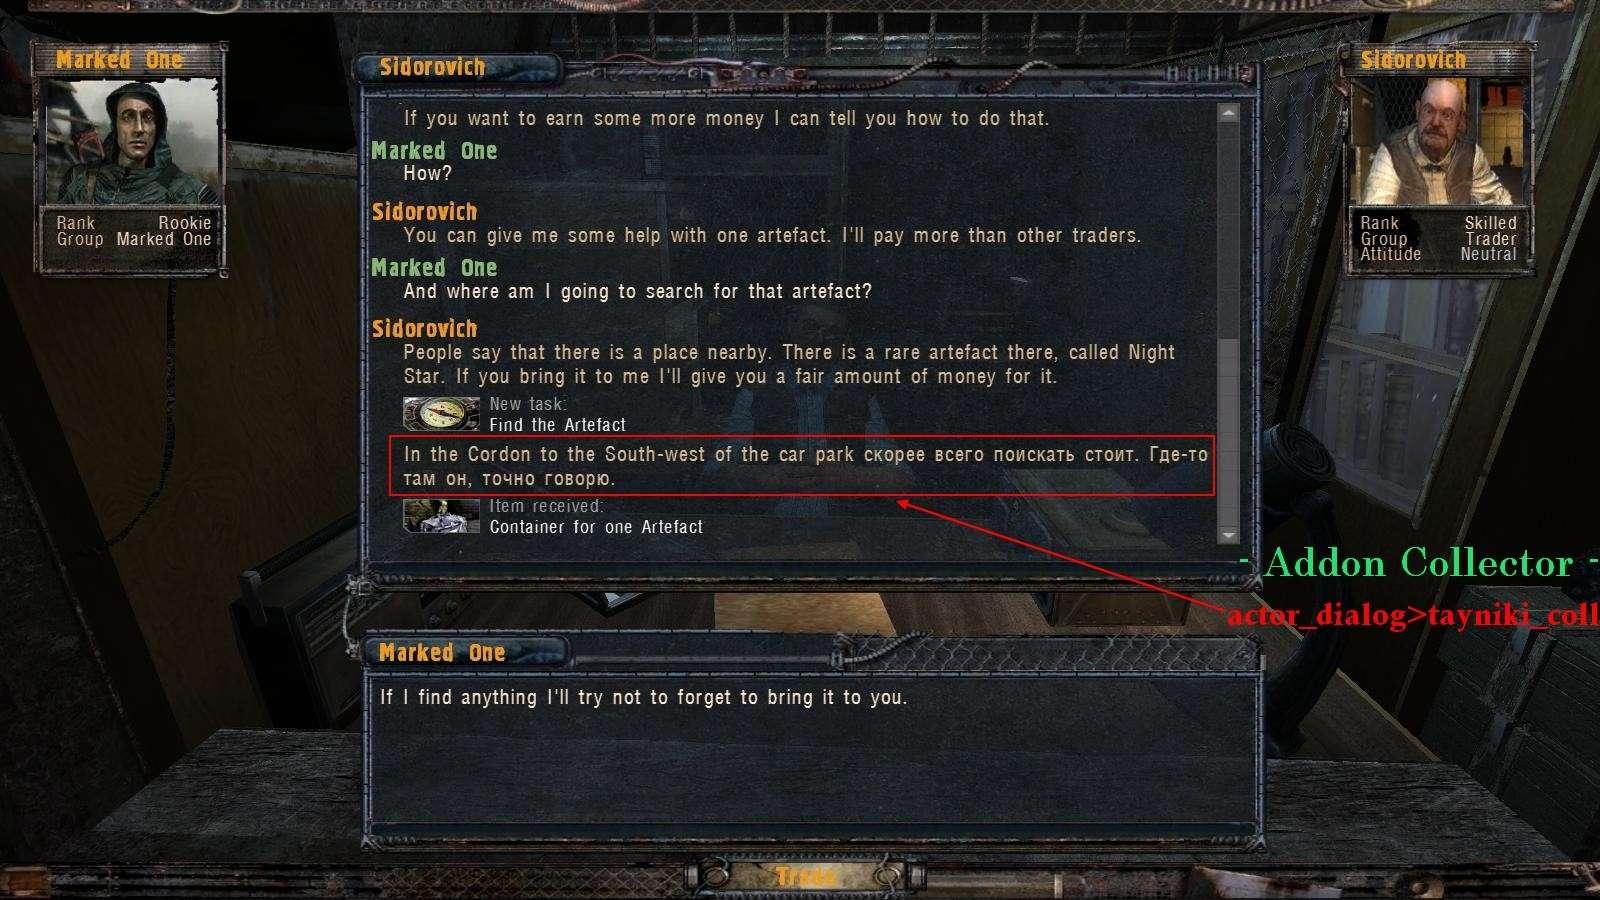 DMX mod 1.3.4 - Traduction Anglaise maintenant Disponible!! - Page 7 Ss_bou24